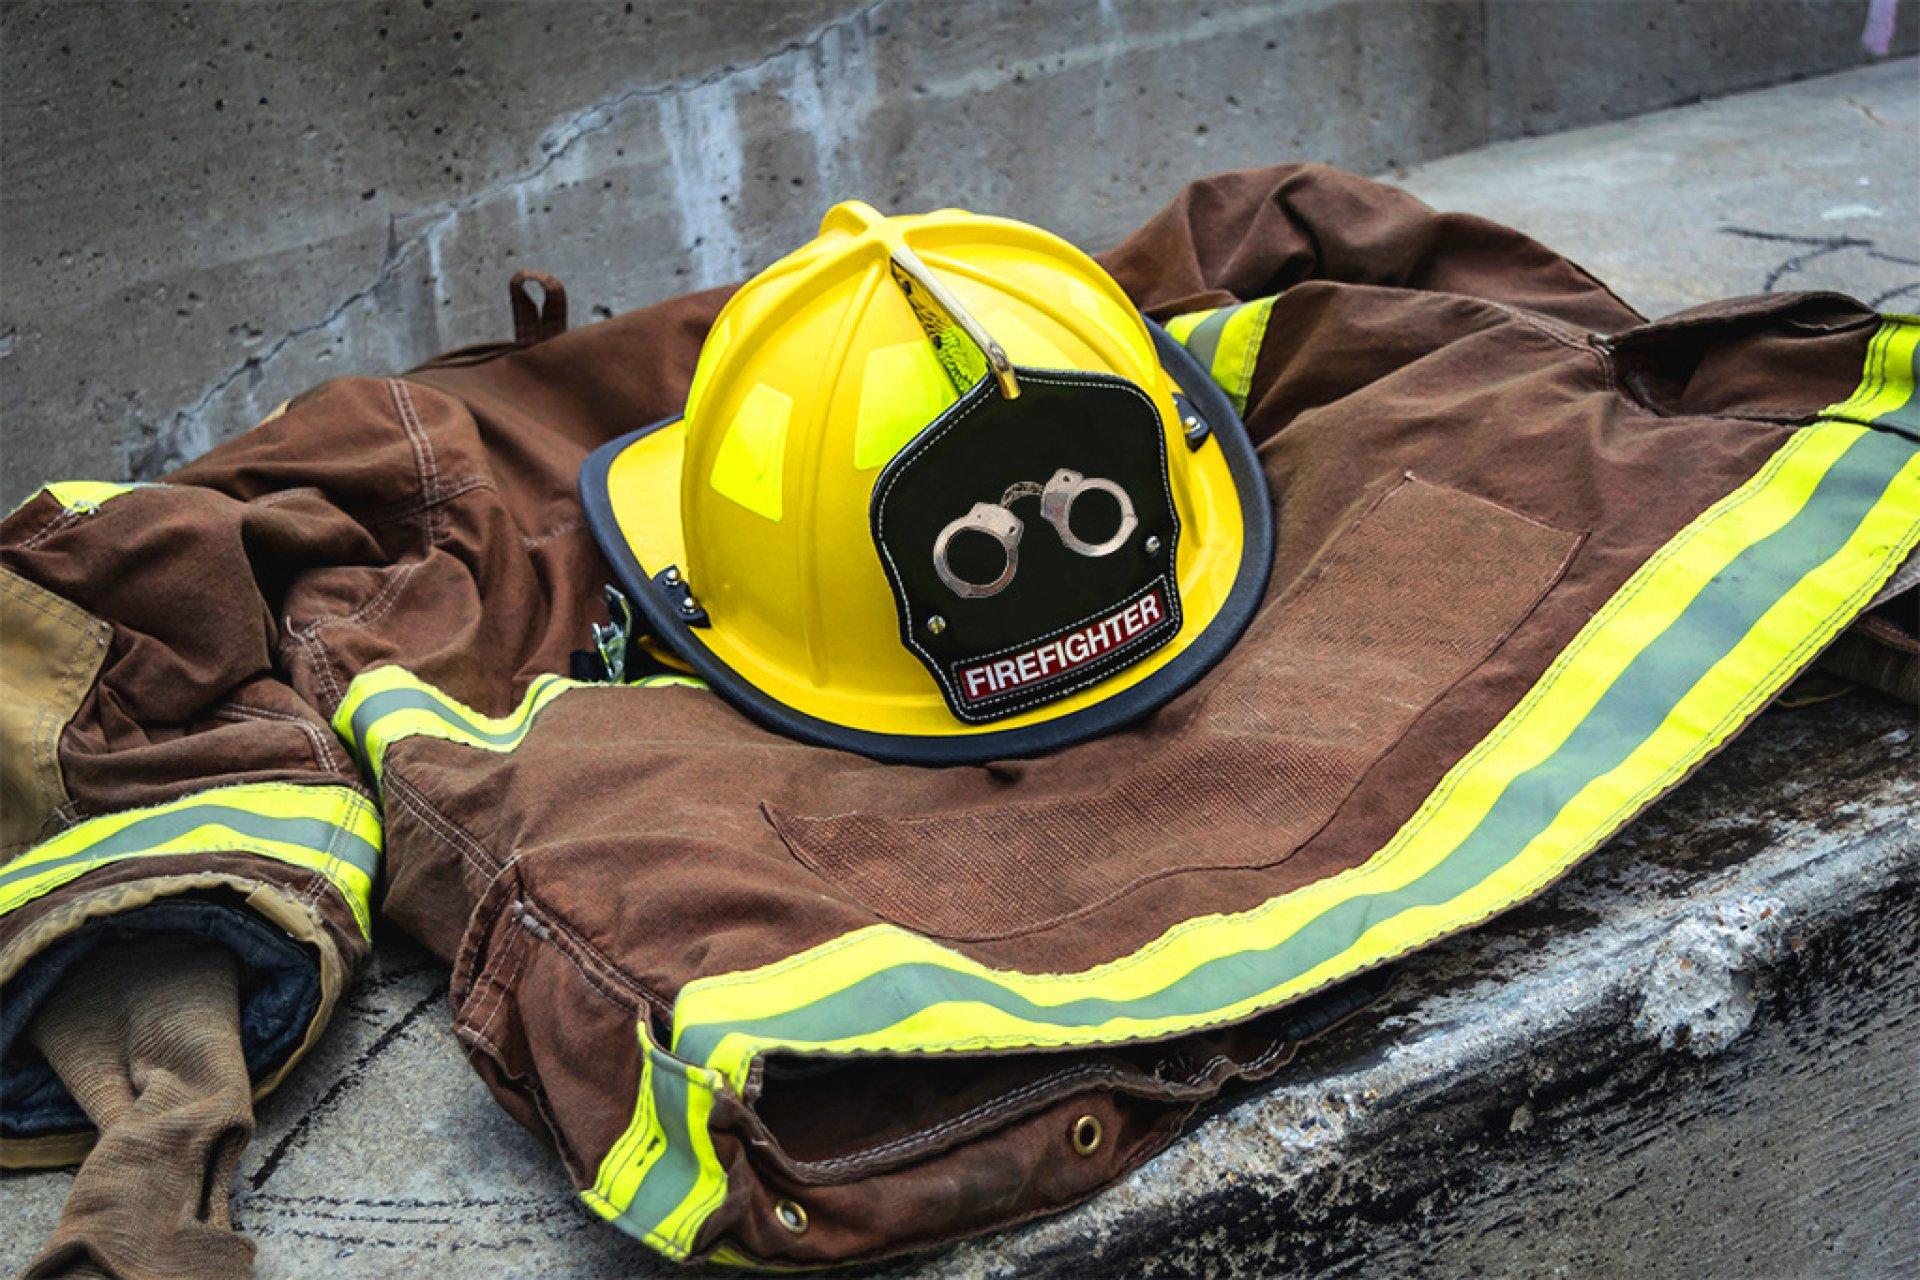 Humboldt County prison inmates battling California's fires make $1 an hour. | Photo Illustration by Megan Bender